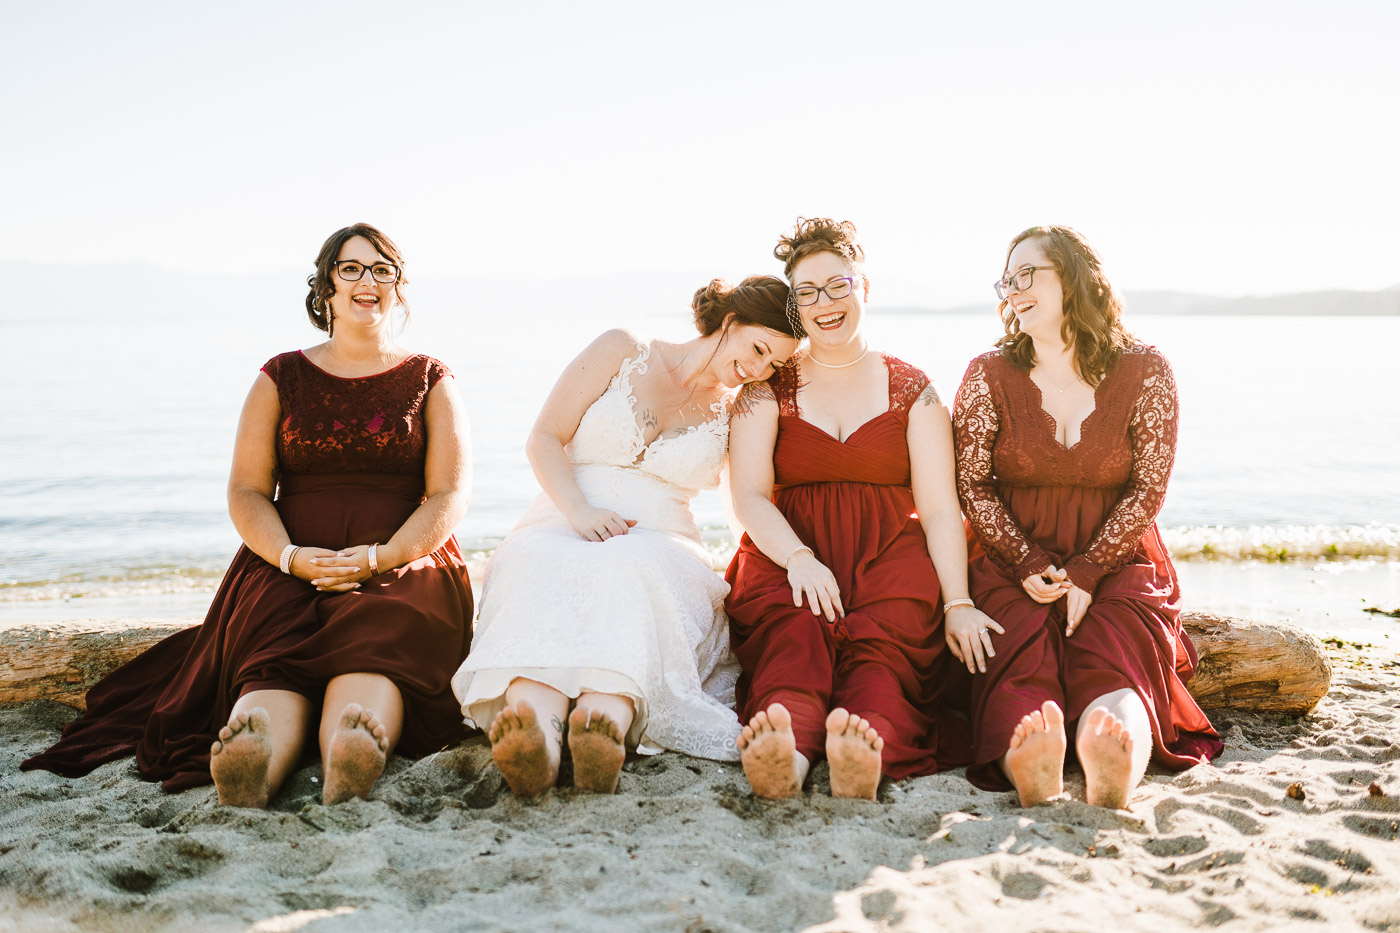 Jon-Mark Photography Victoria BC Wedding Photography - Hatley Castle Wedding Photography - Bear Mountain Wedding Photography Bridesmaids